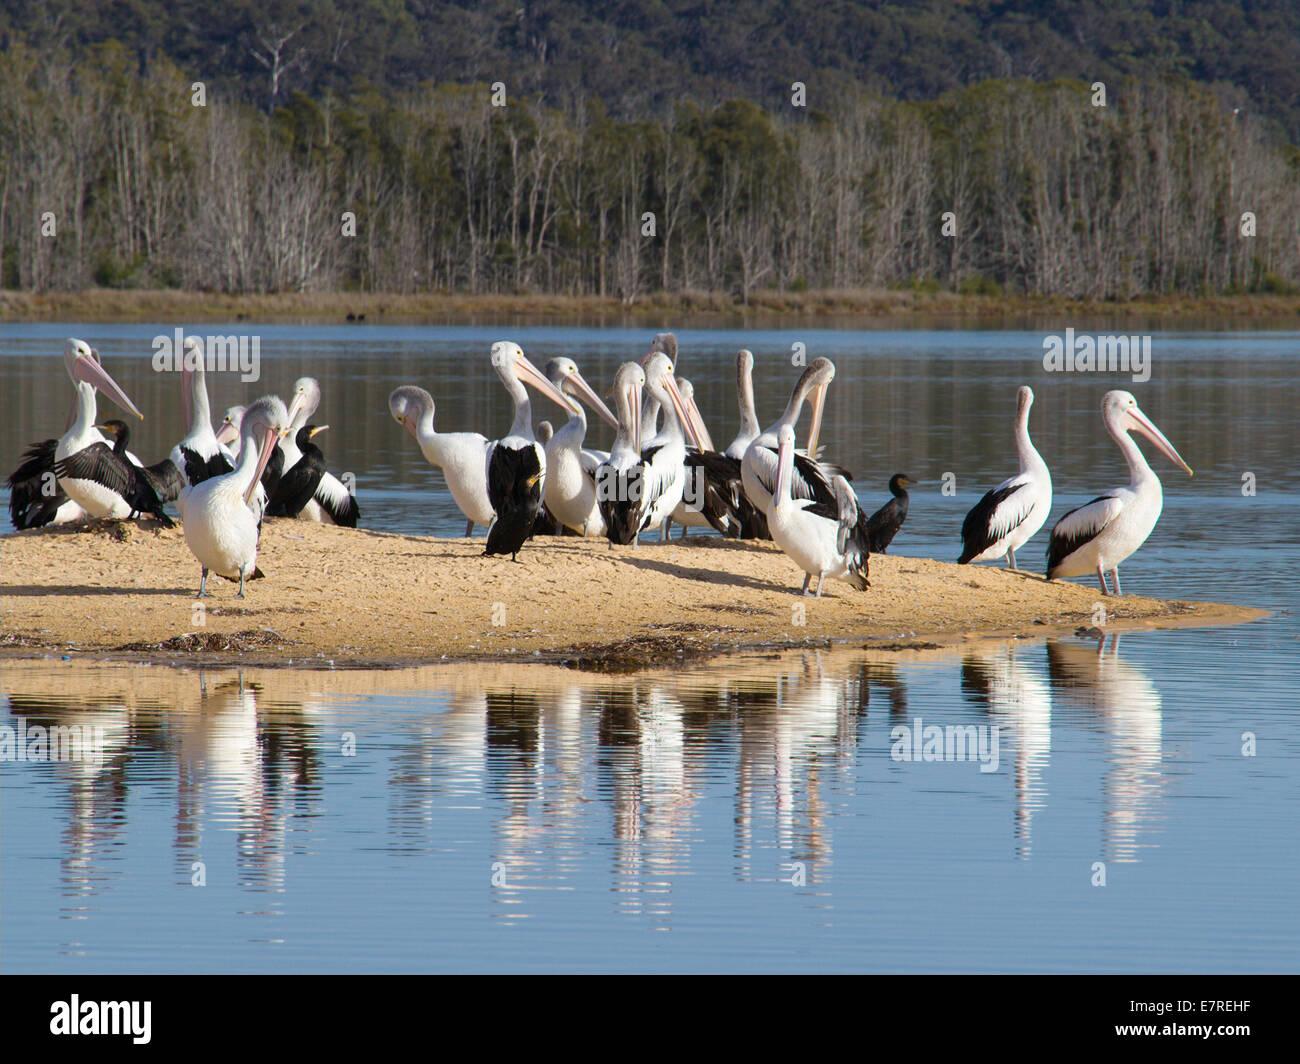 Pelicans on a sandbar - Stock Image